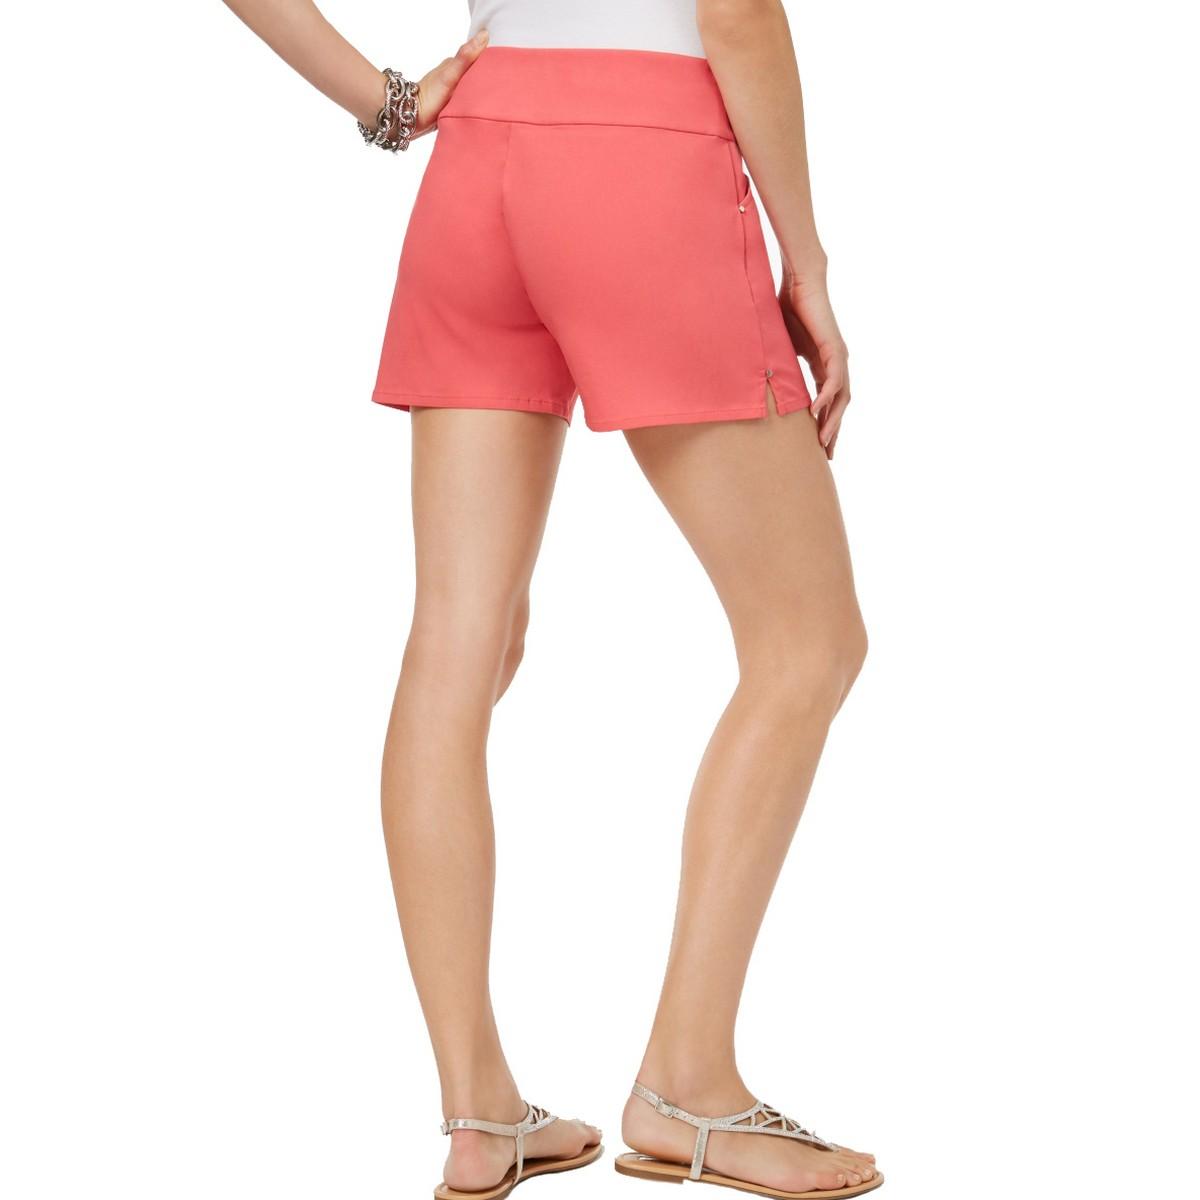 INC-NEW-Women-039-s-Pull-On-Curvy-Fit-Front-Pockets-Khaki-Chino-Shorts-TEDO thumbnail 4